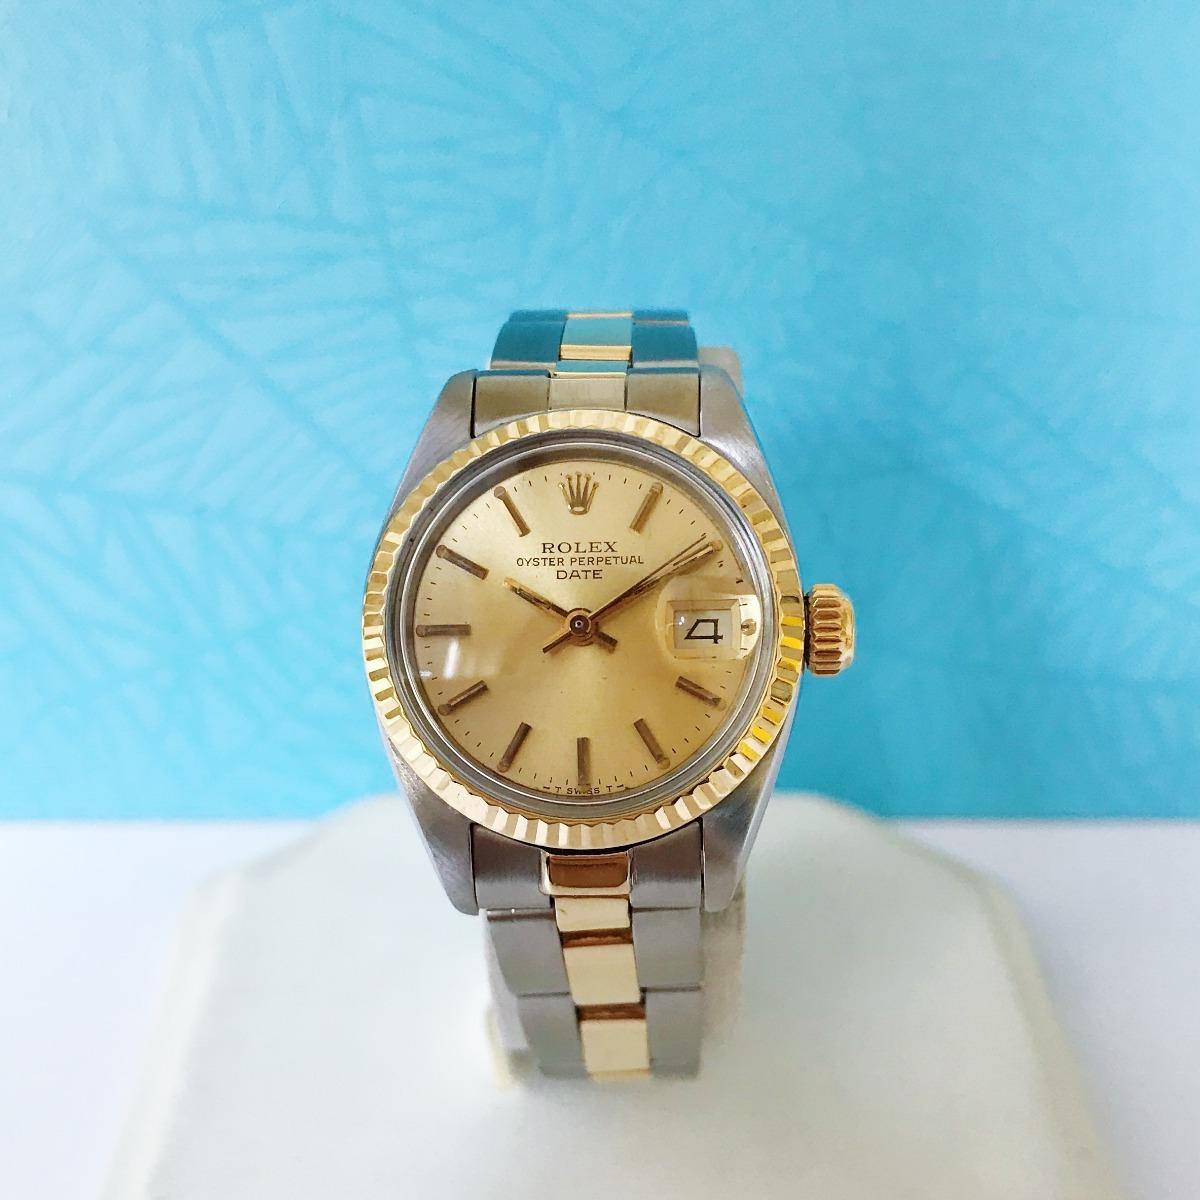 83f0fcae54c reloj de mujer rolex 6917 oyster perpetual date. Cargando zoom.